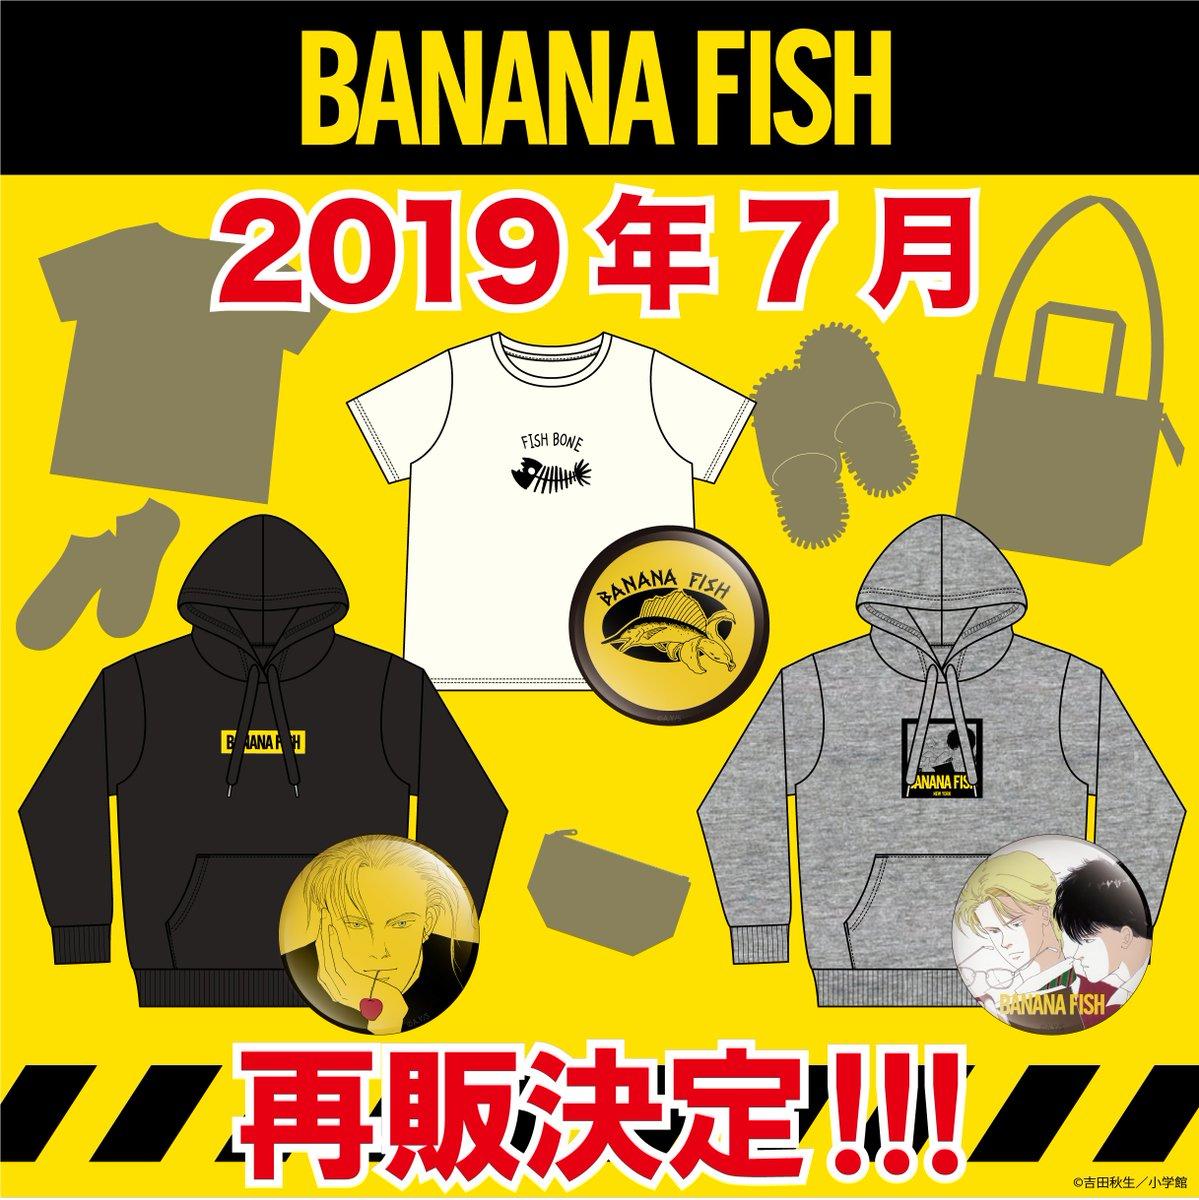 test ツイッターメディア - BANANA FISHのレディースアイテムが全国のアベイルにて再販決定! 大好評につき、新アイテムも販売決定! 今後の情報をお楽しみに! #BANANAFISH #バナナフィッシュ #Avail #アベイル https://t.co/d27onwjBIs